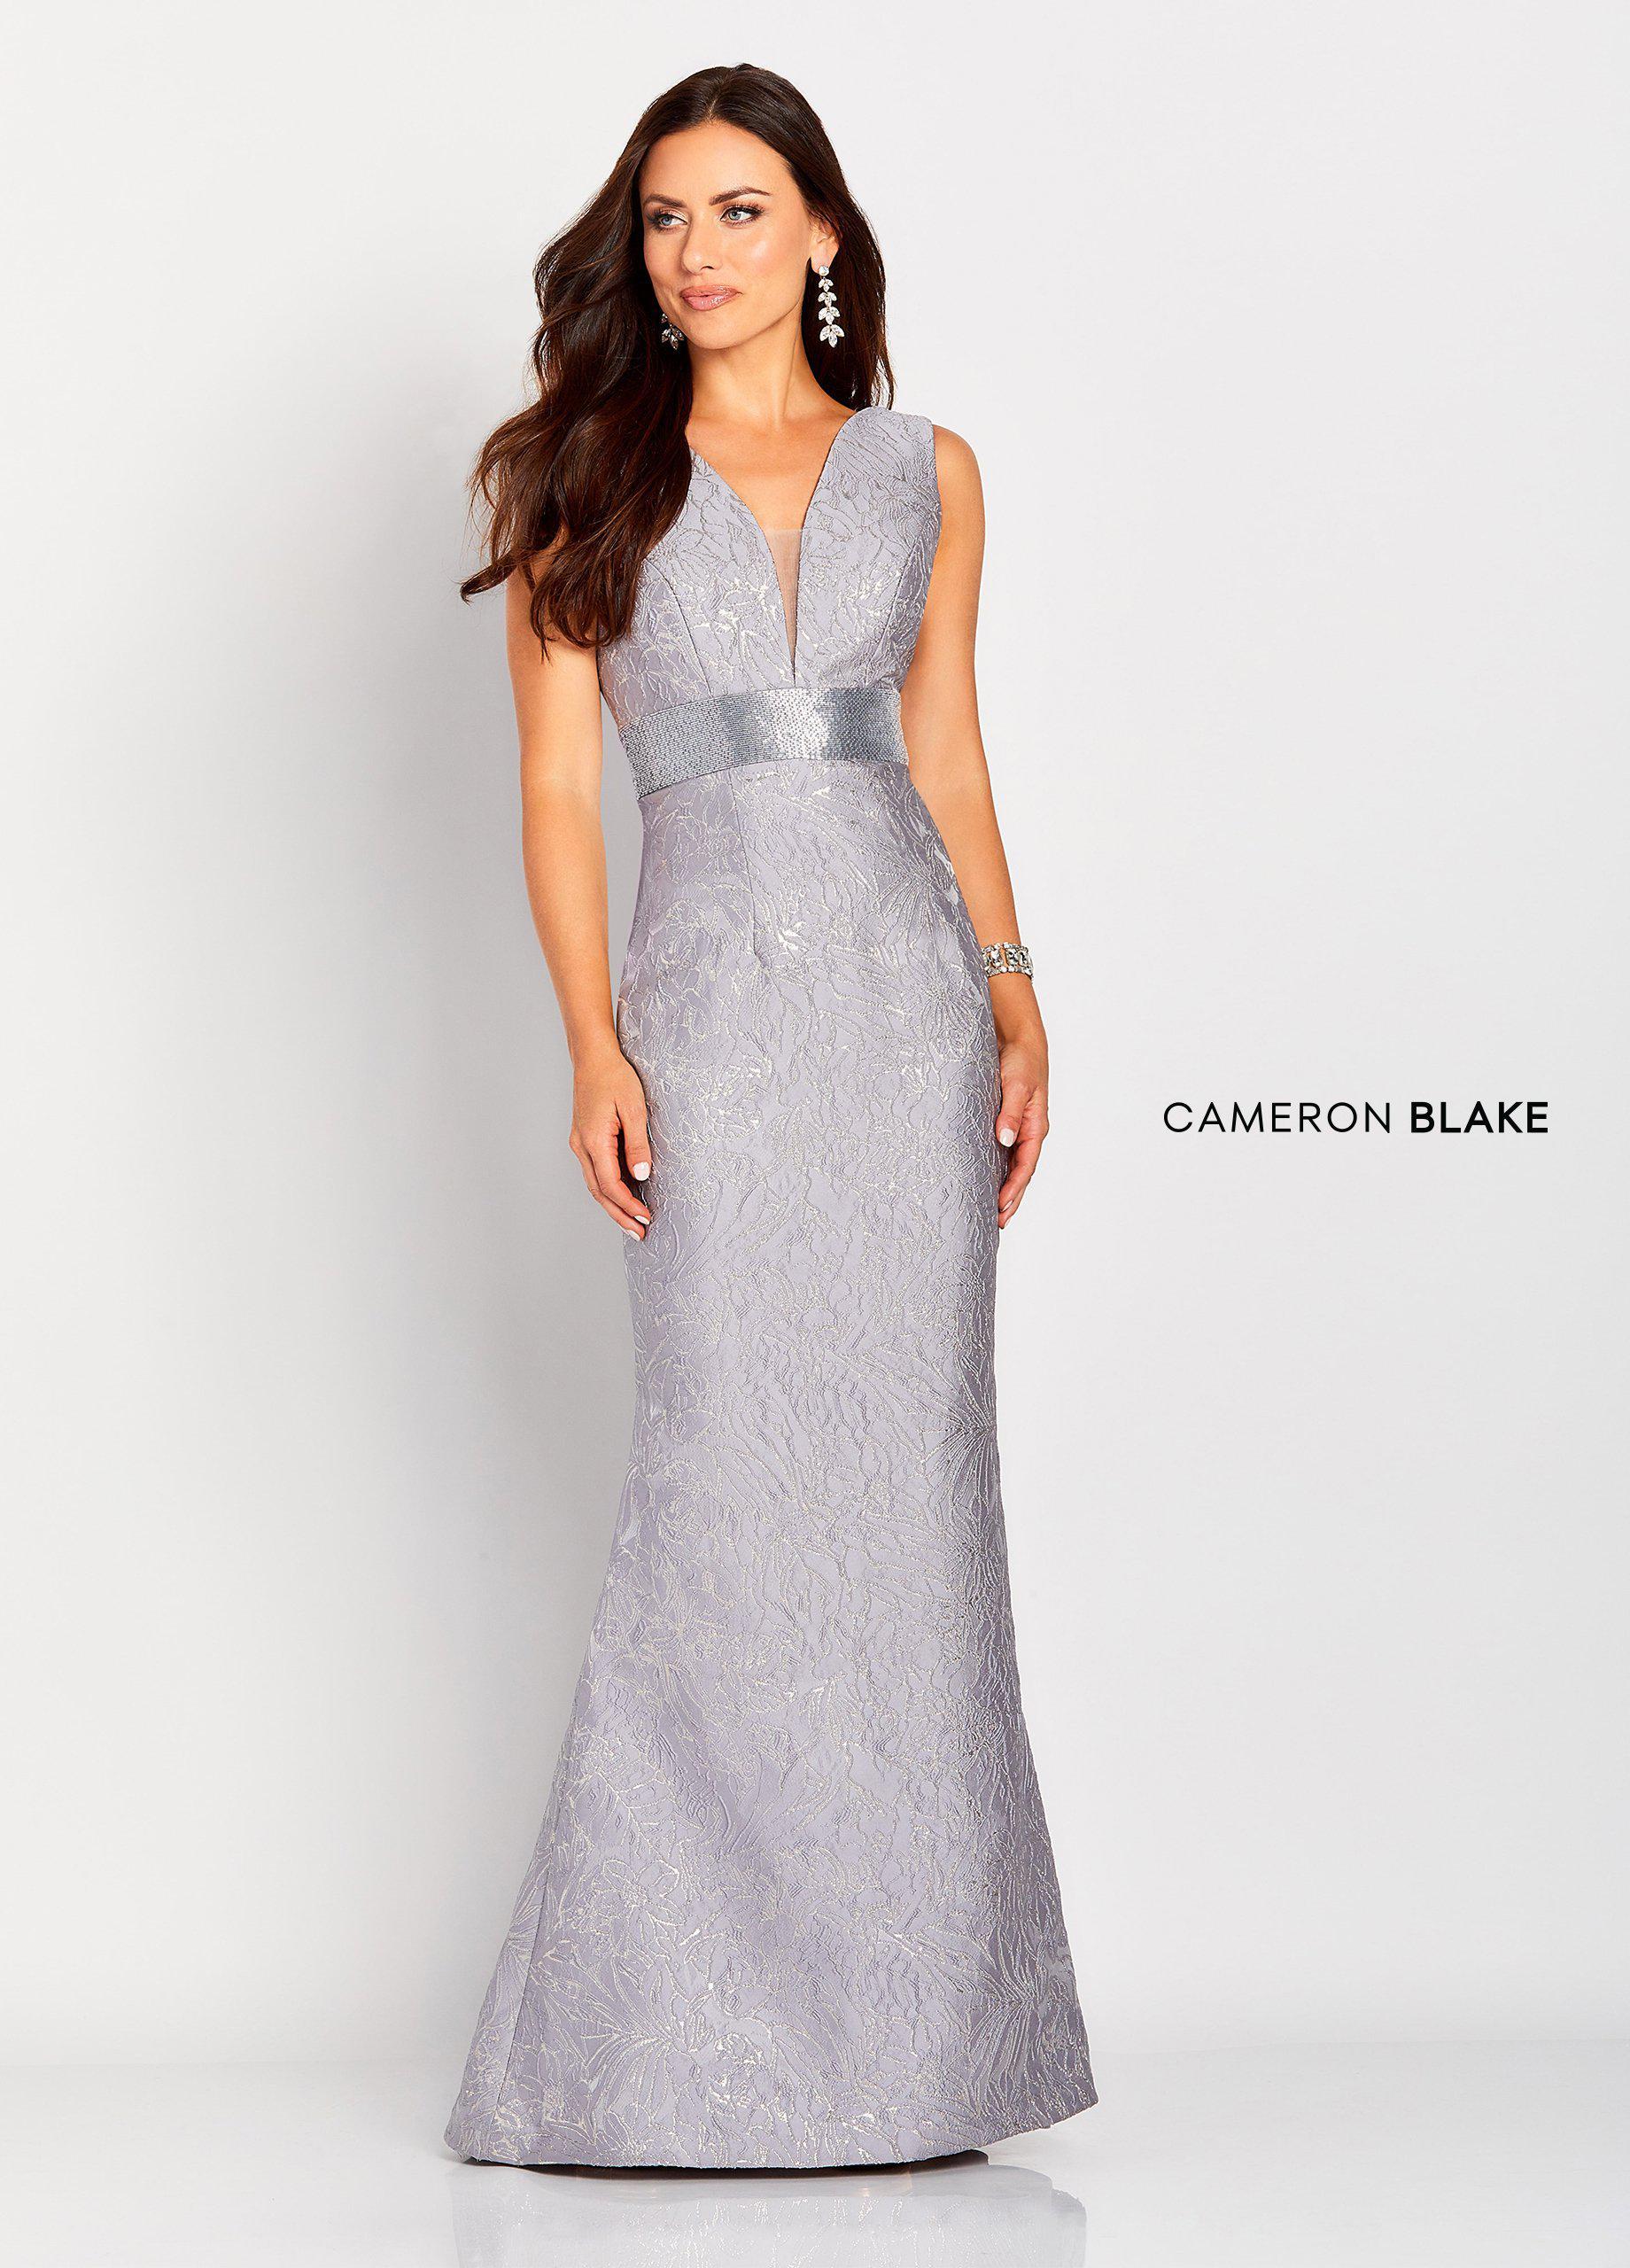 b60be44734 Lyst - Mon Cheri Cameron Blake By - 119669 Plunging Metallic Brocade ...